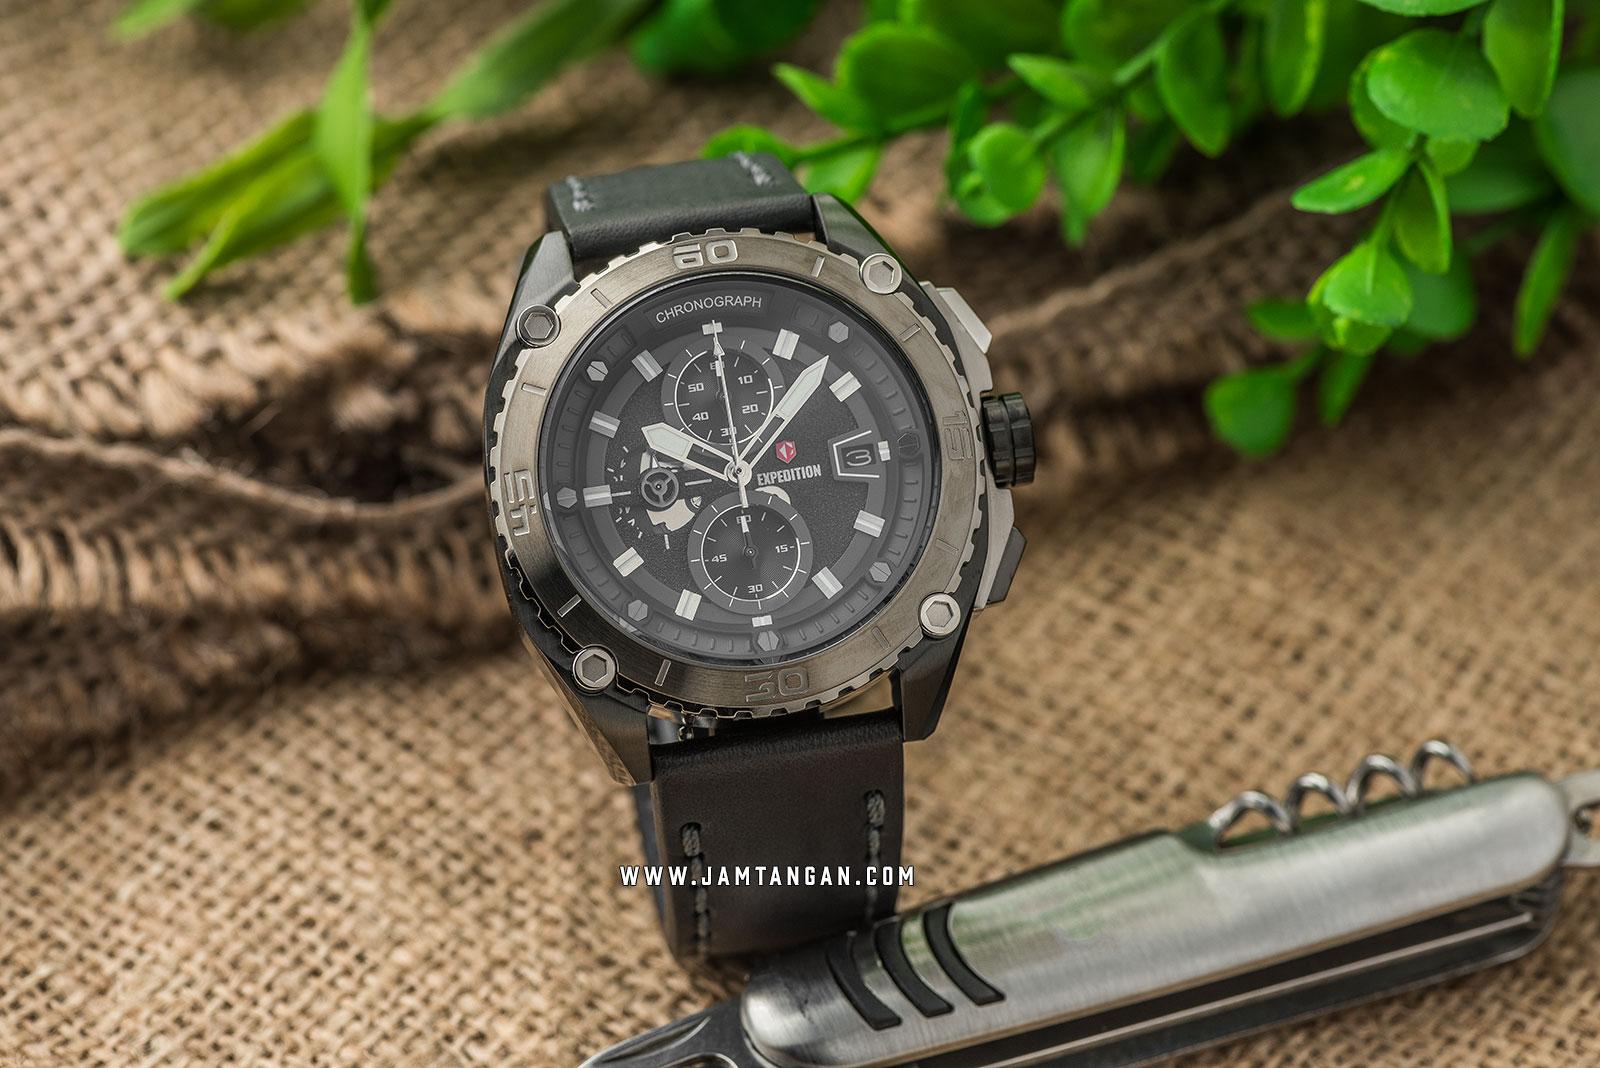 Expedition E 6777 MC LTEBA Chronograph Men Black Dial Black Leather Strap Machtwatch